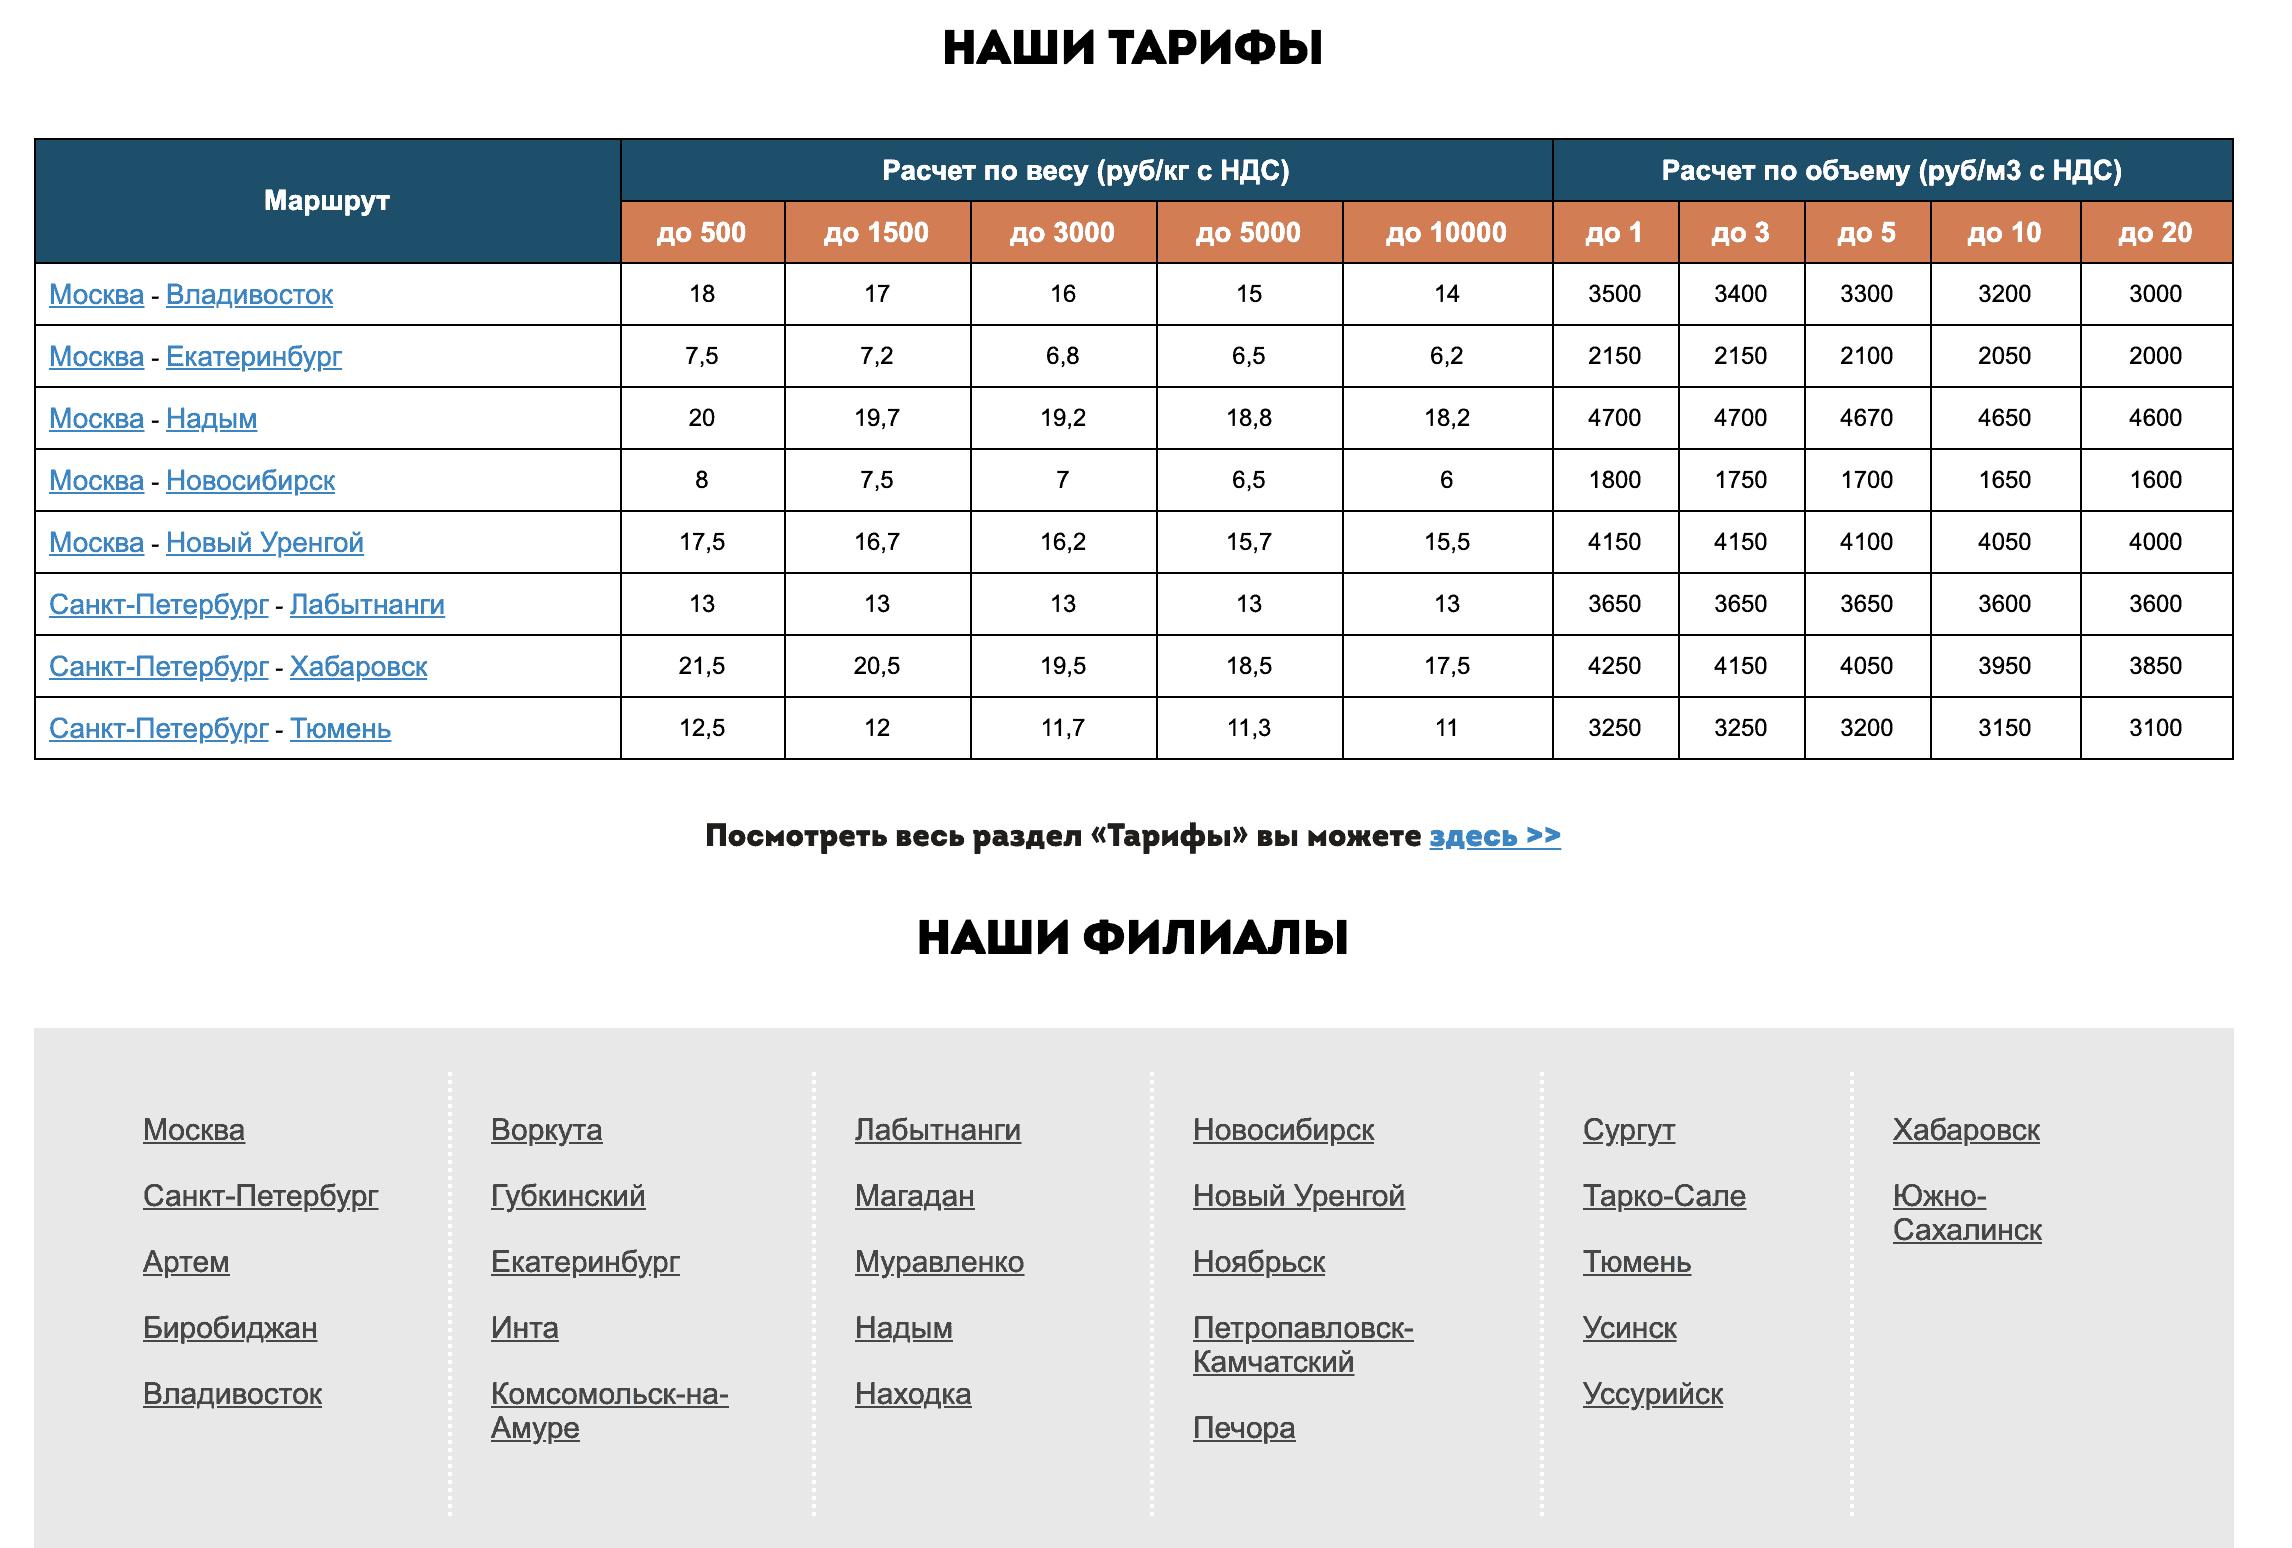 тарифы рг групп